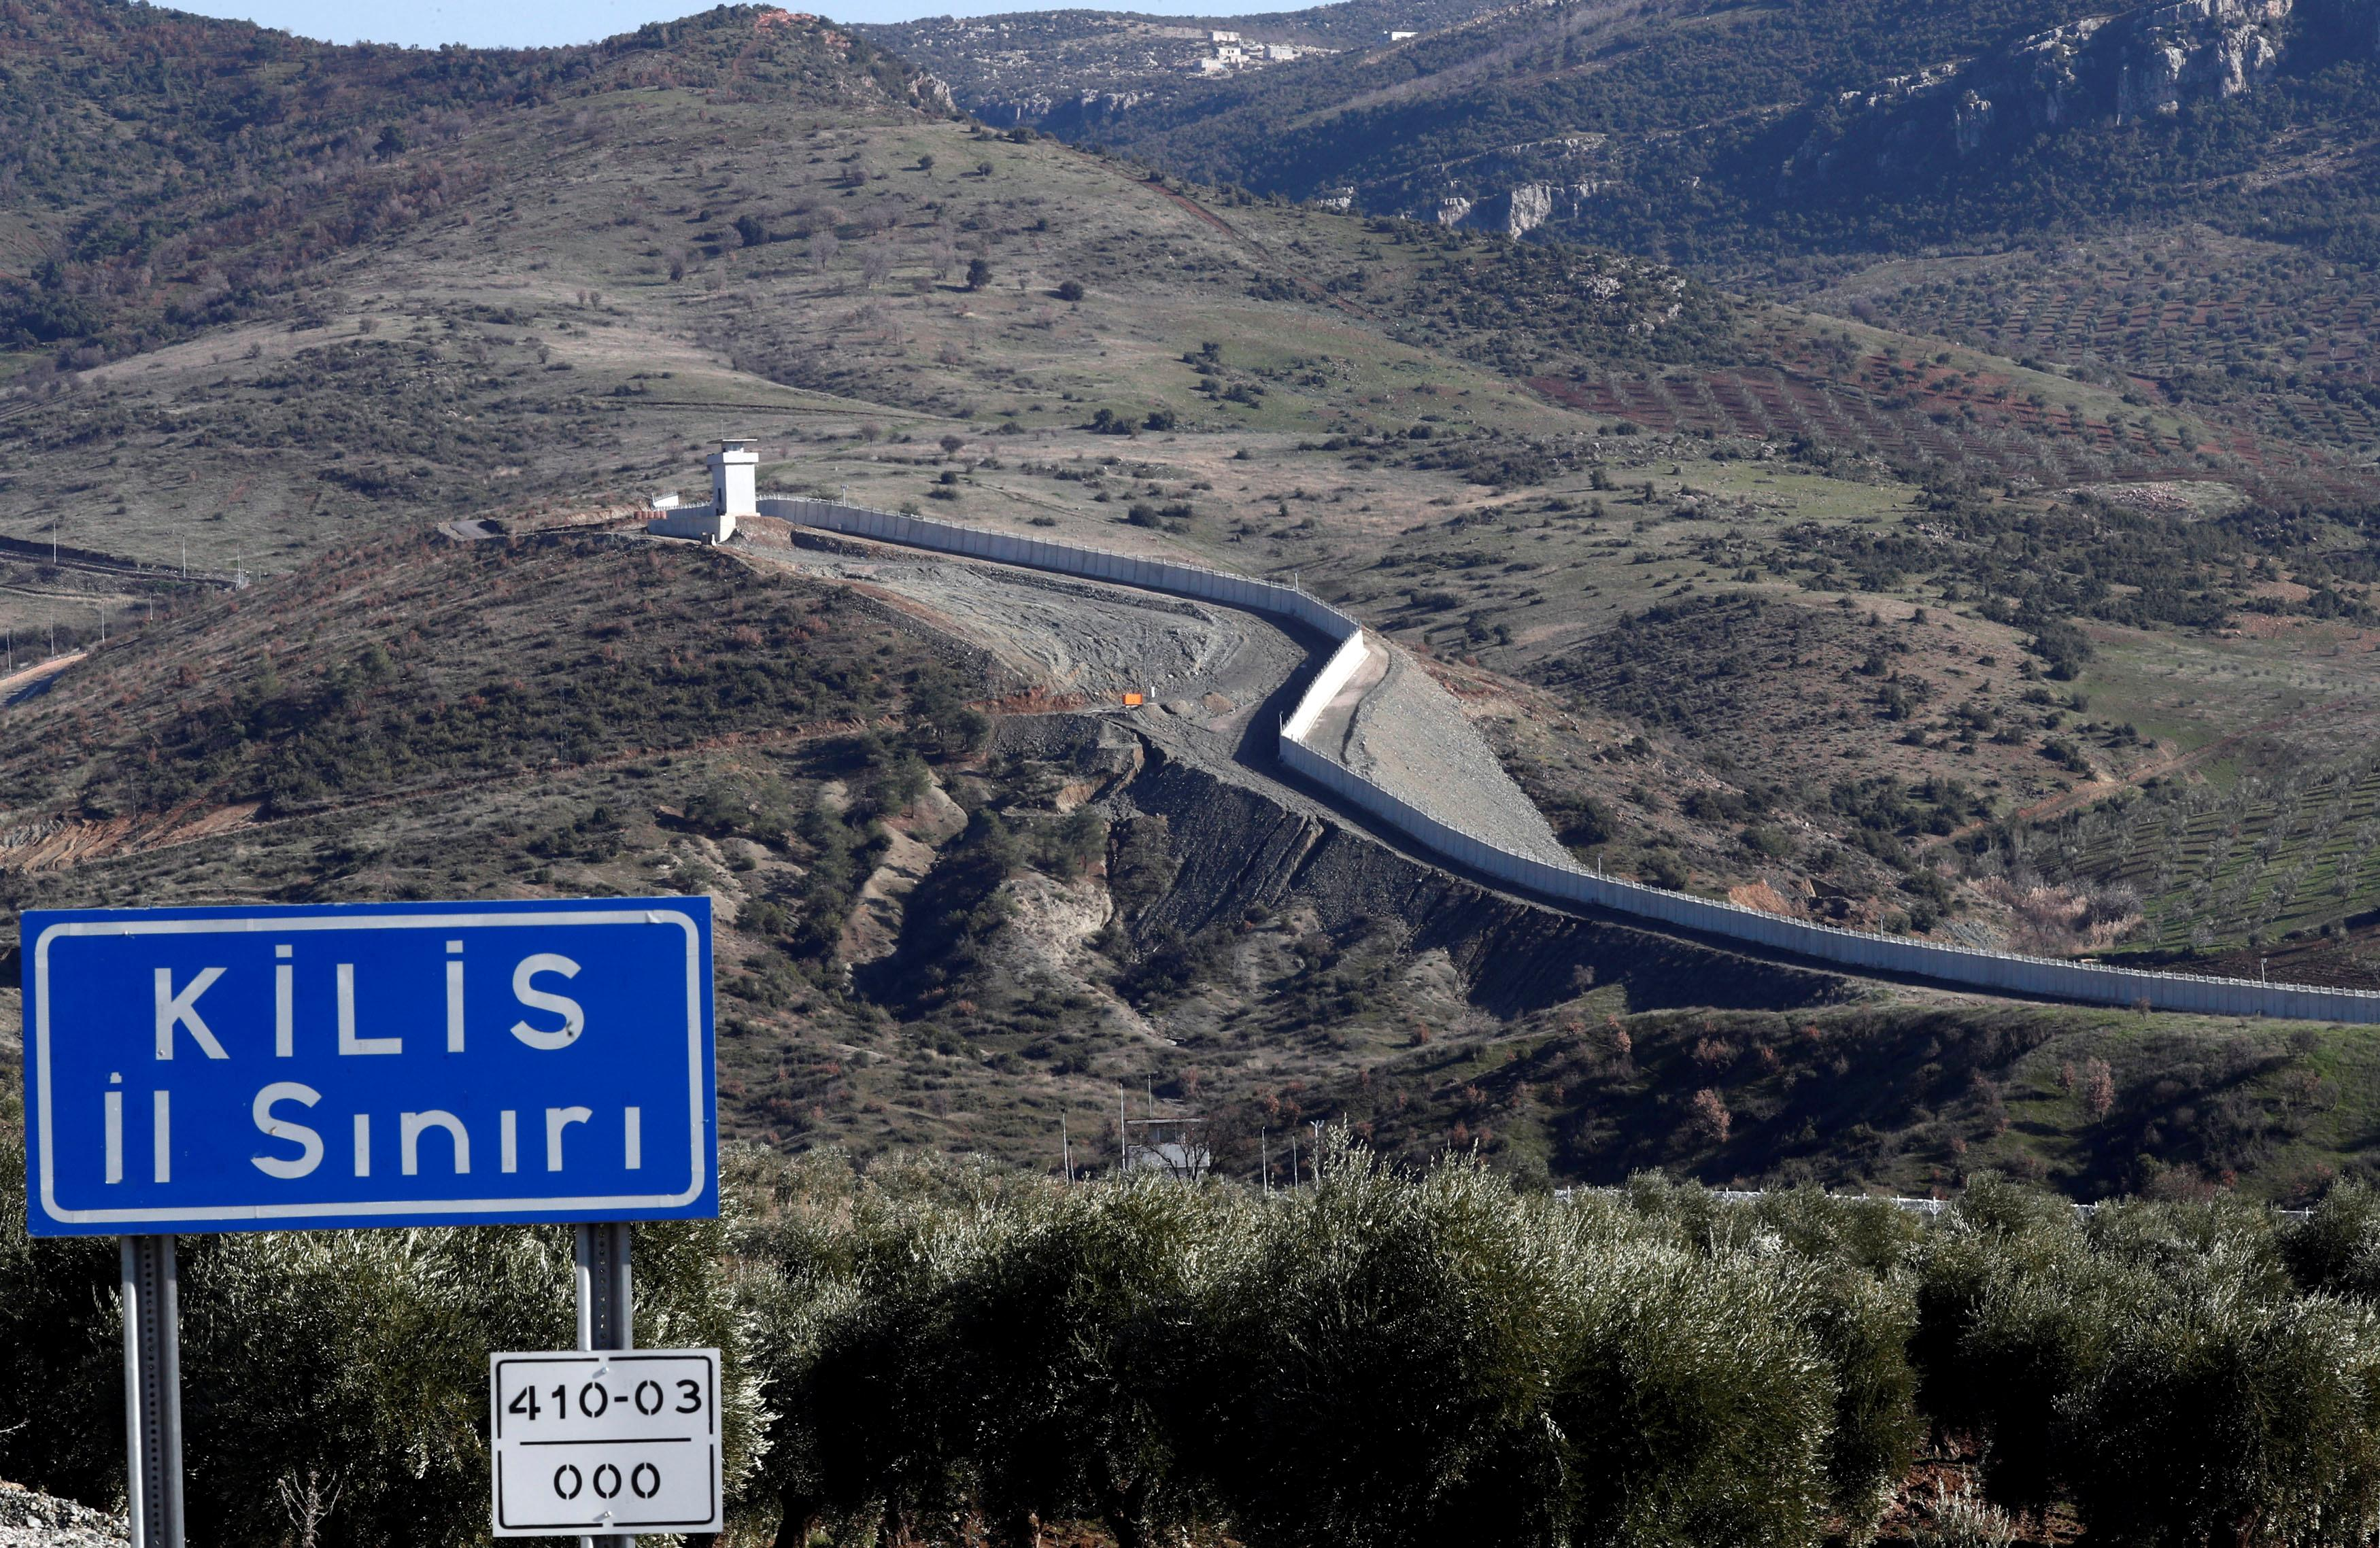 Hasil gambar untuk Turkey bolsters military on Syrian border as U.S. readies pull-out